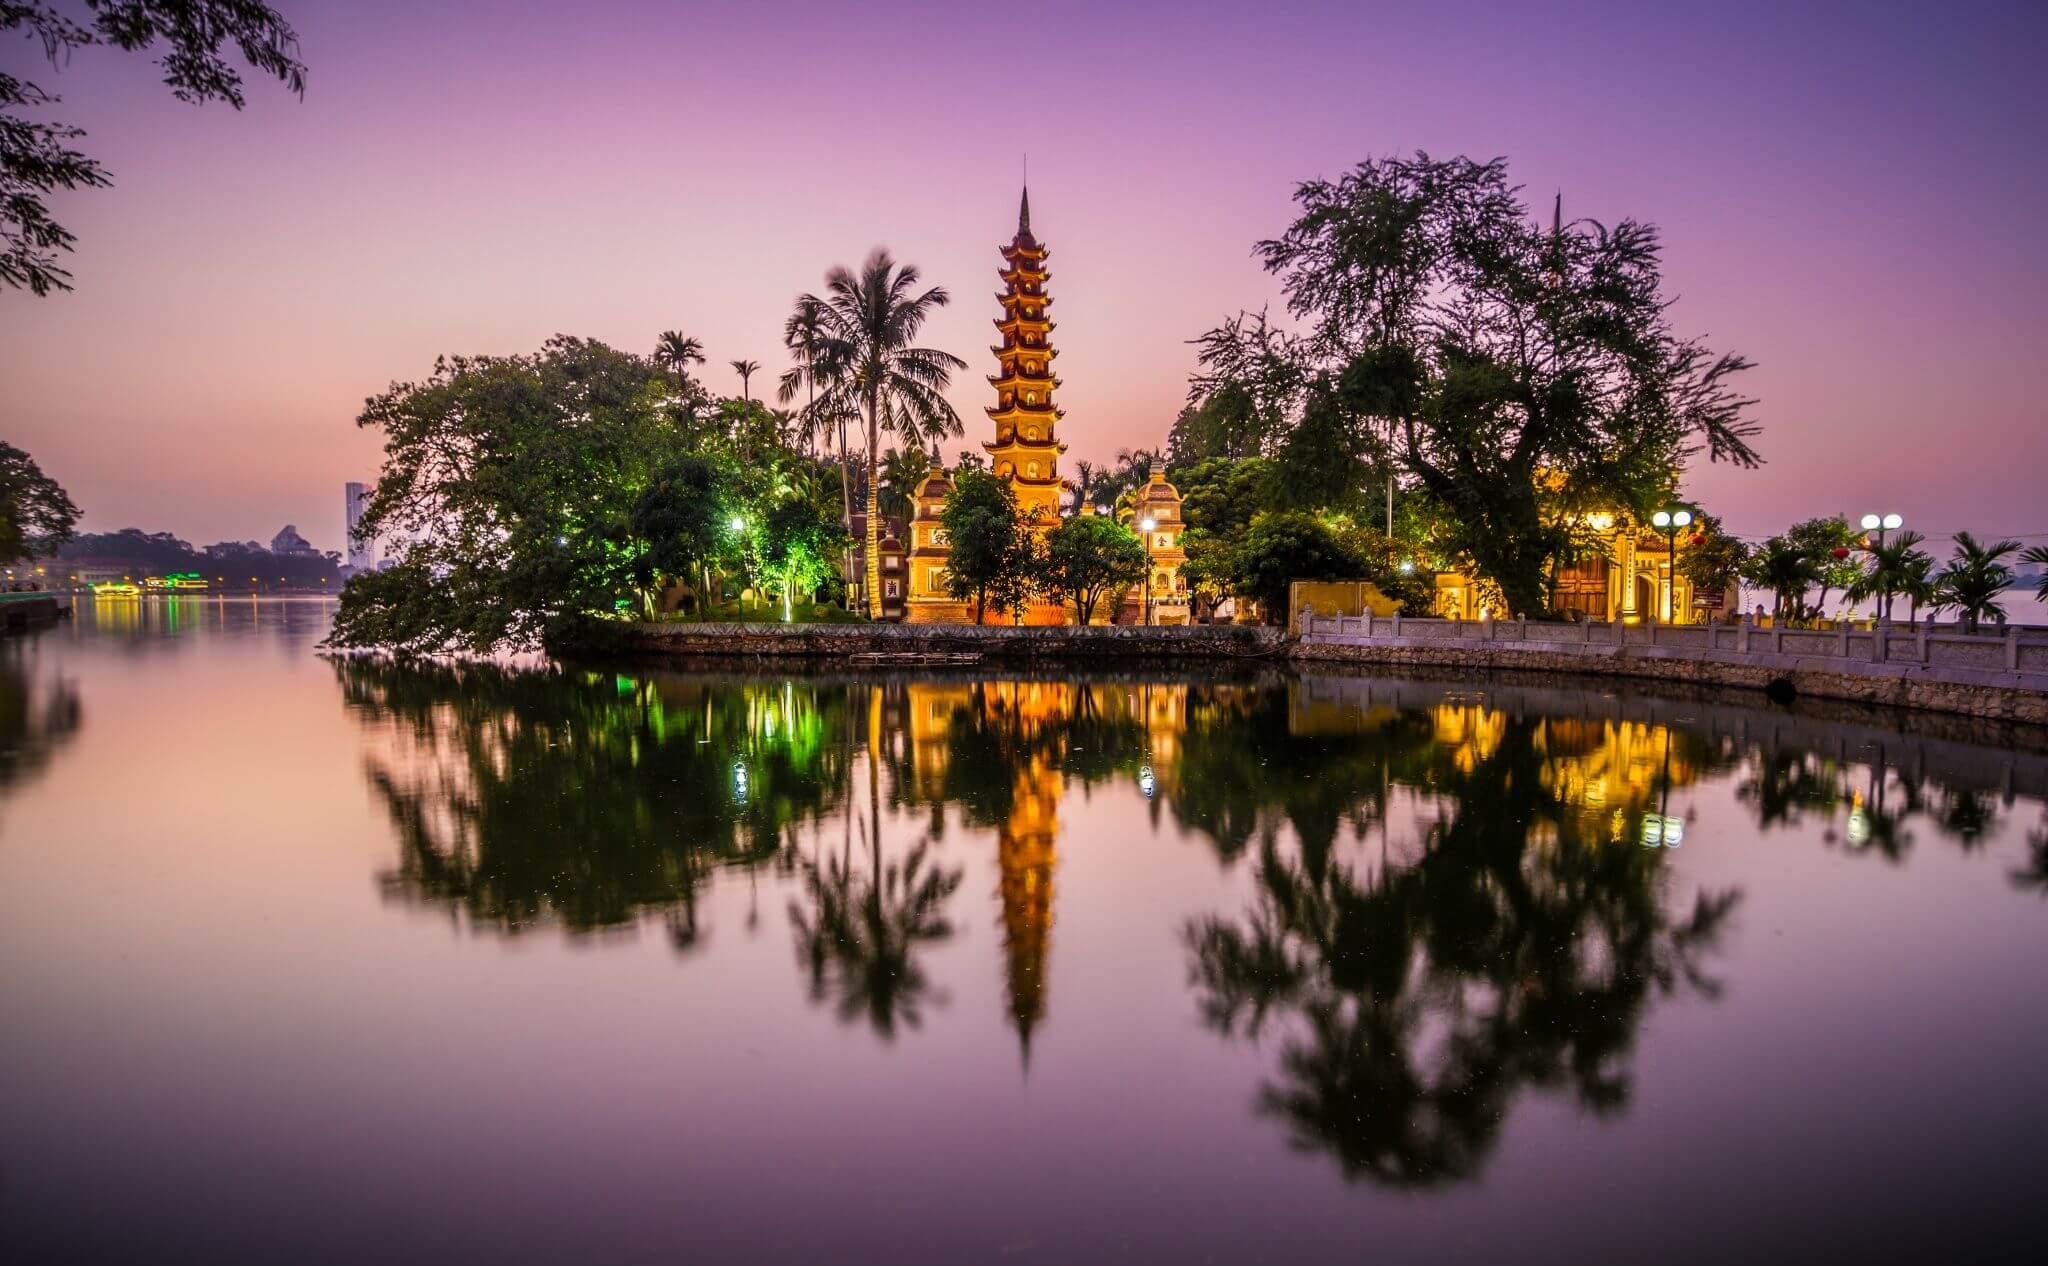 voyage-au-nord-vietnam-10-jours-1